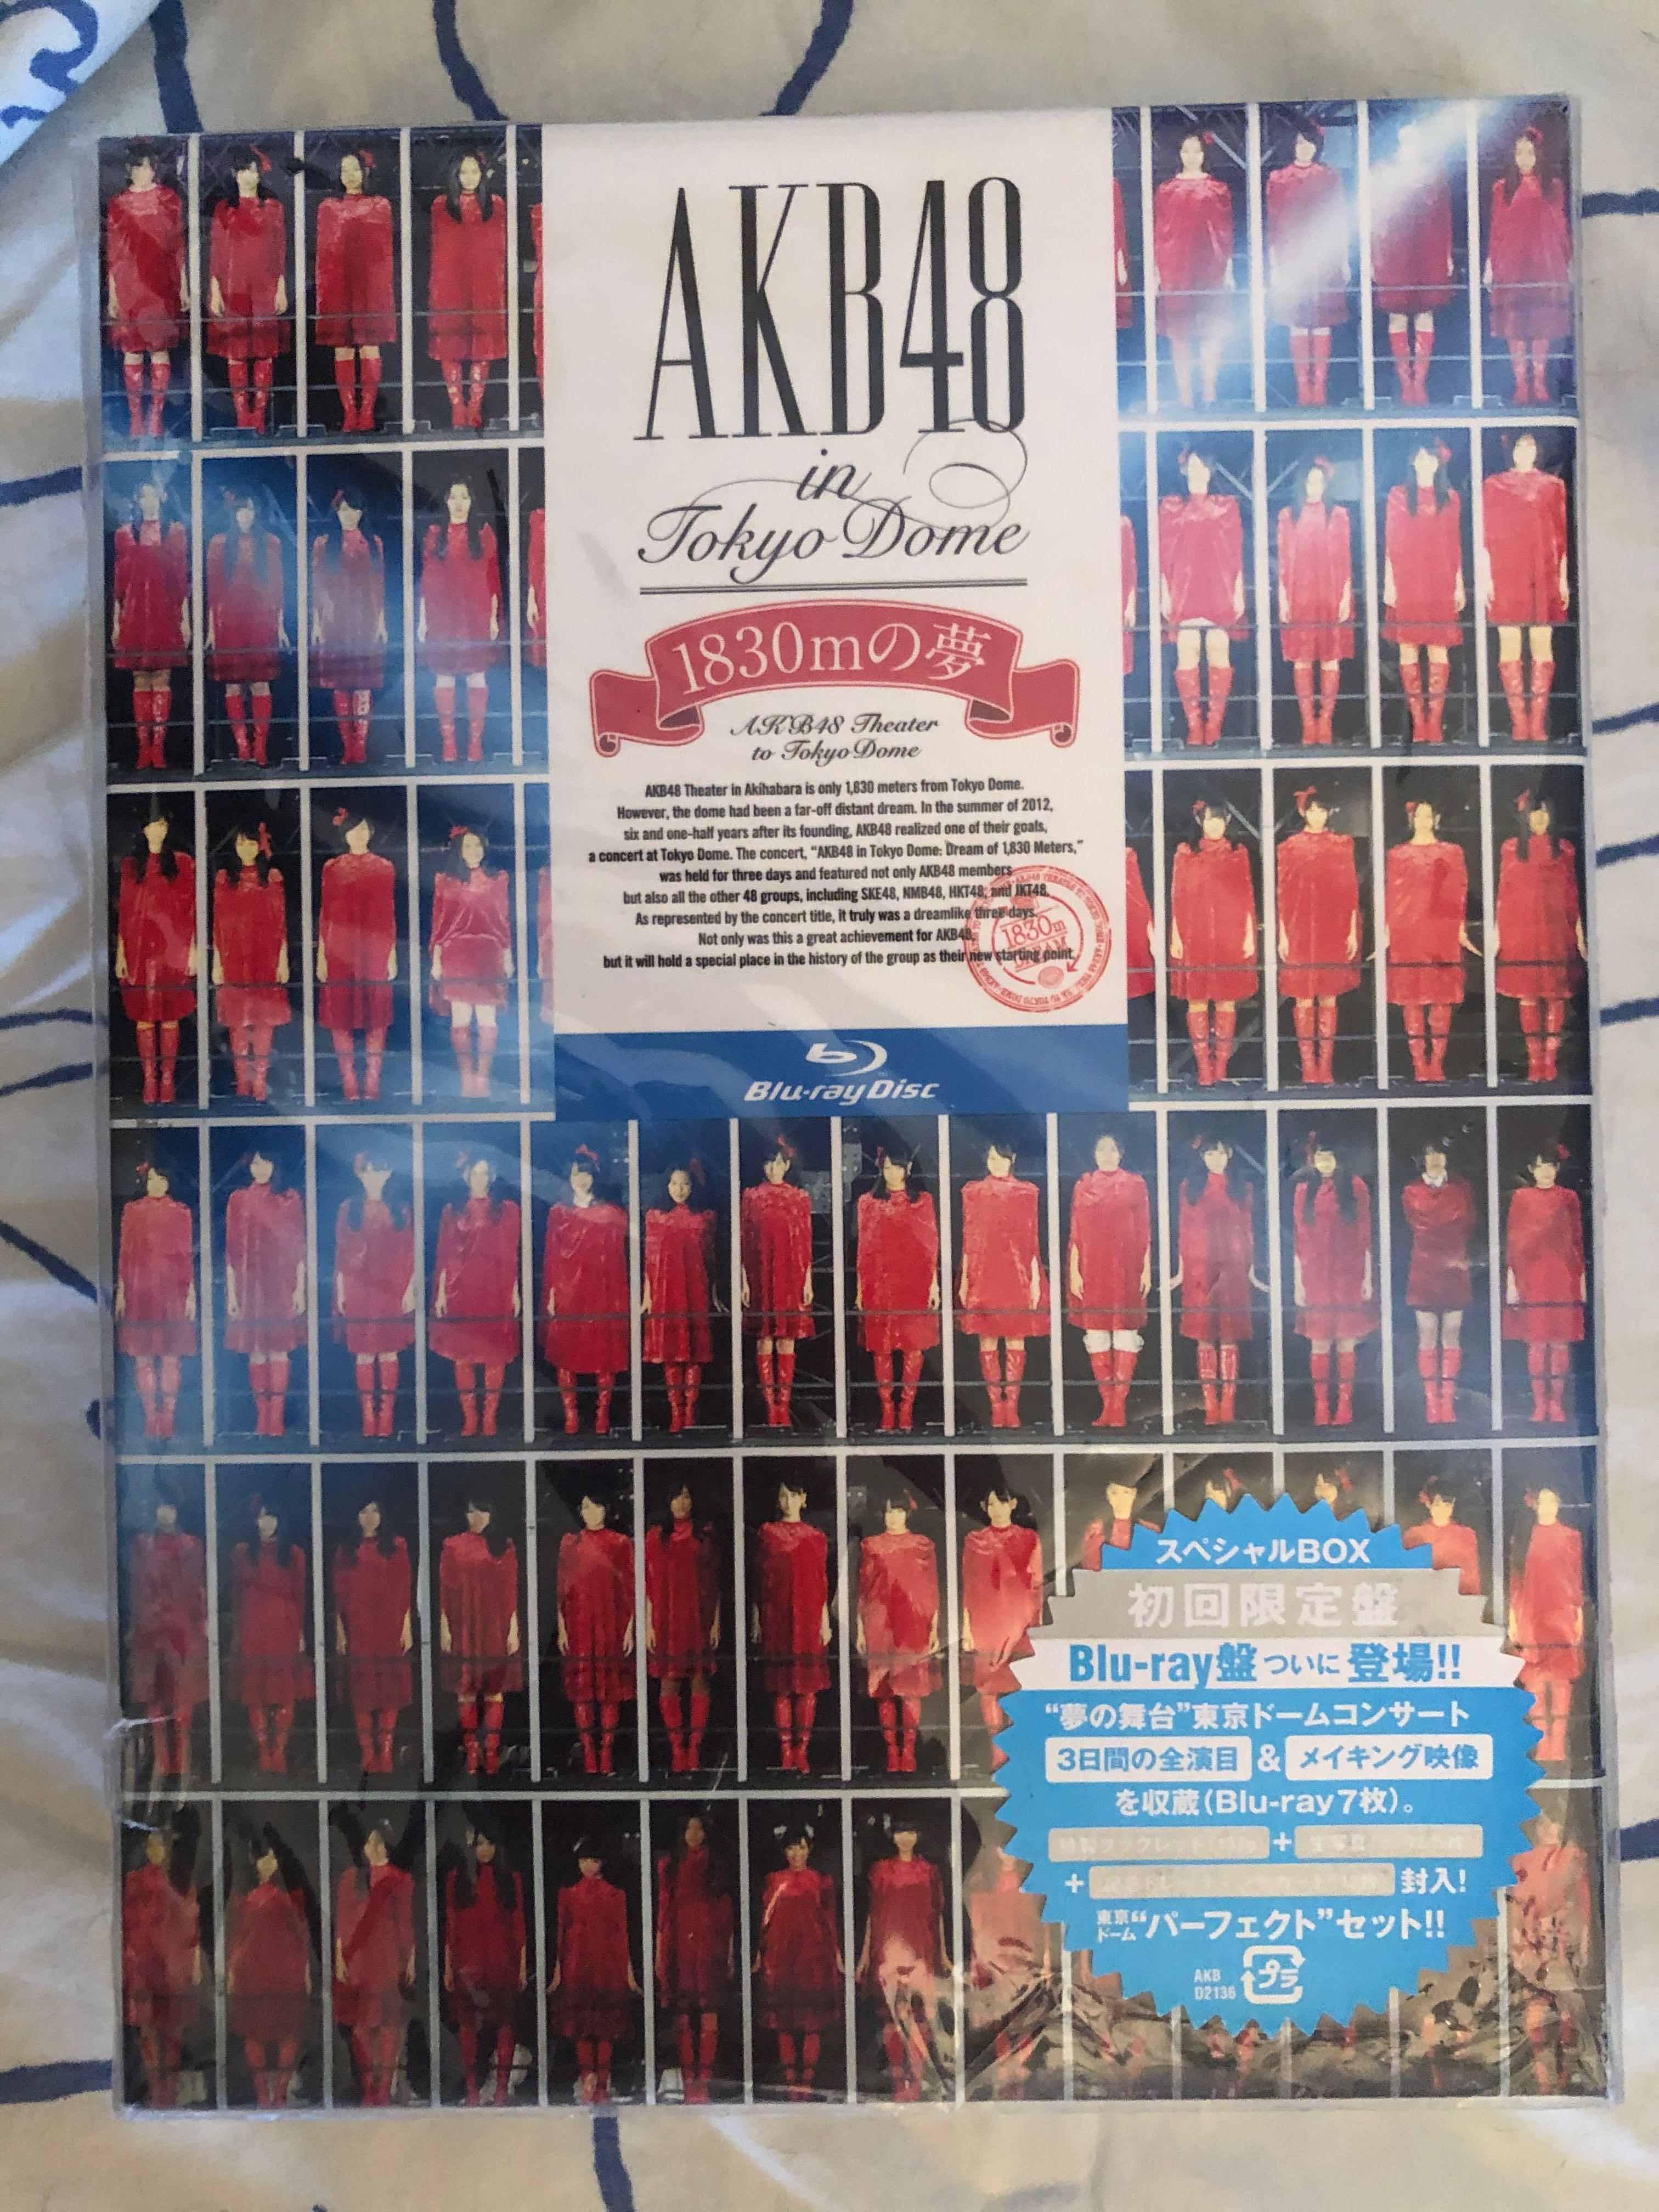 罕有!🈹️AKB48 in Tokyo Dome 初回限定版藍光Blu-ray Boxset